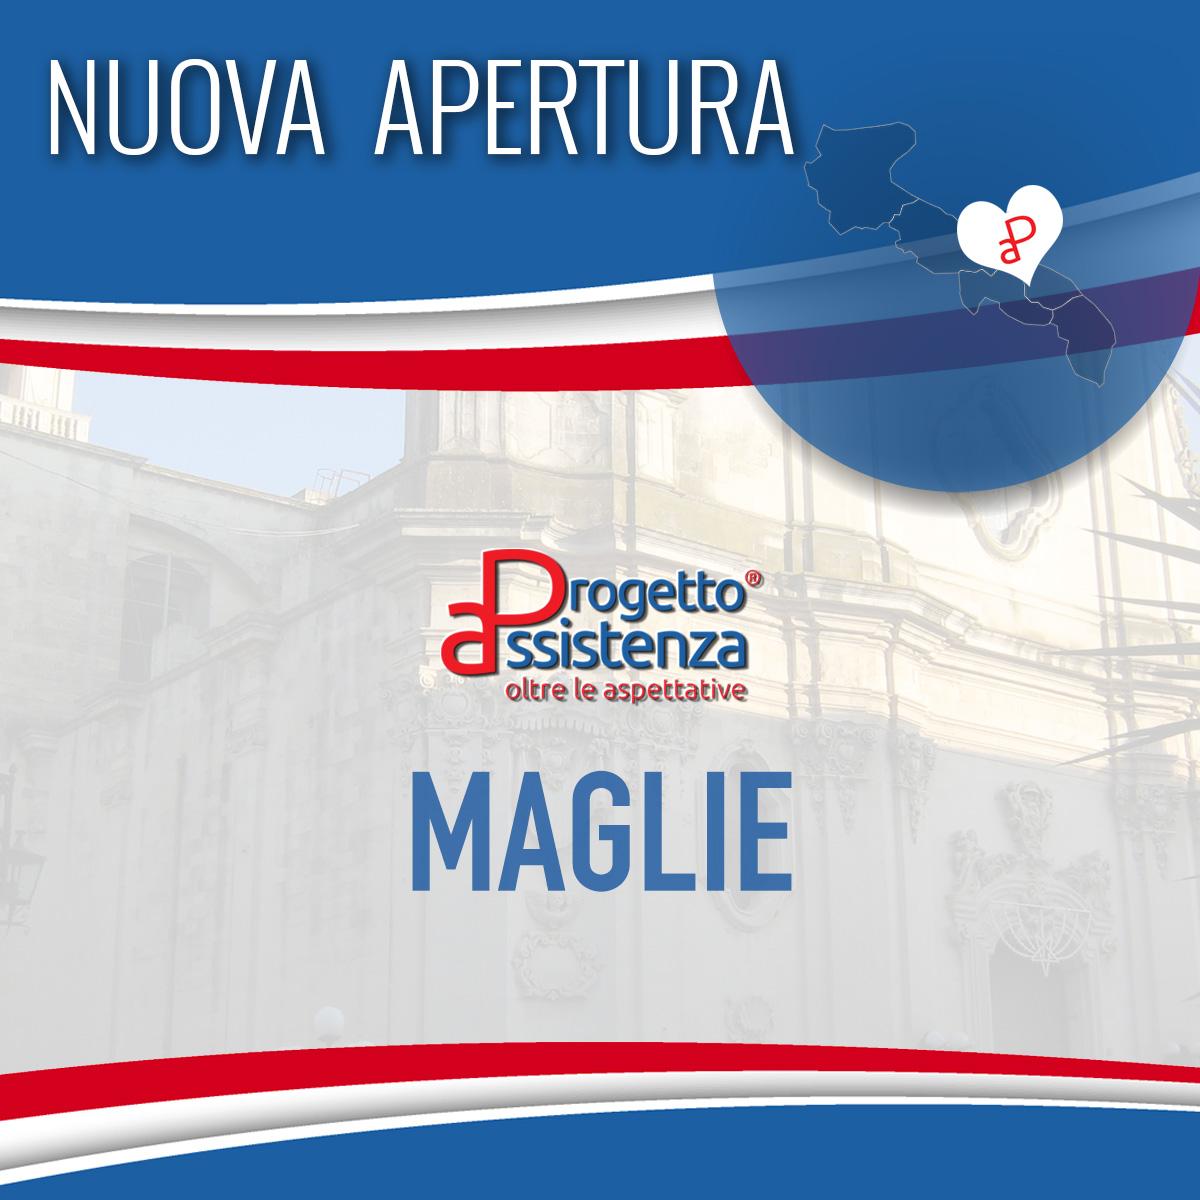 Nuova Apertura: Maglie